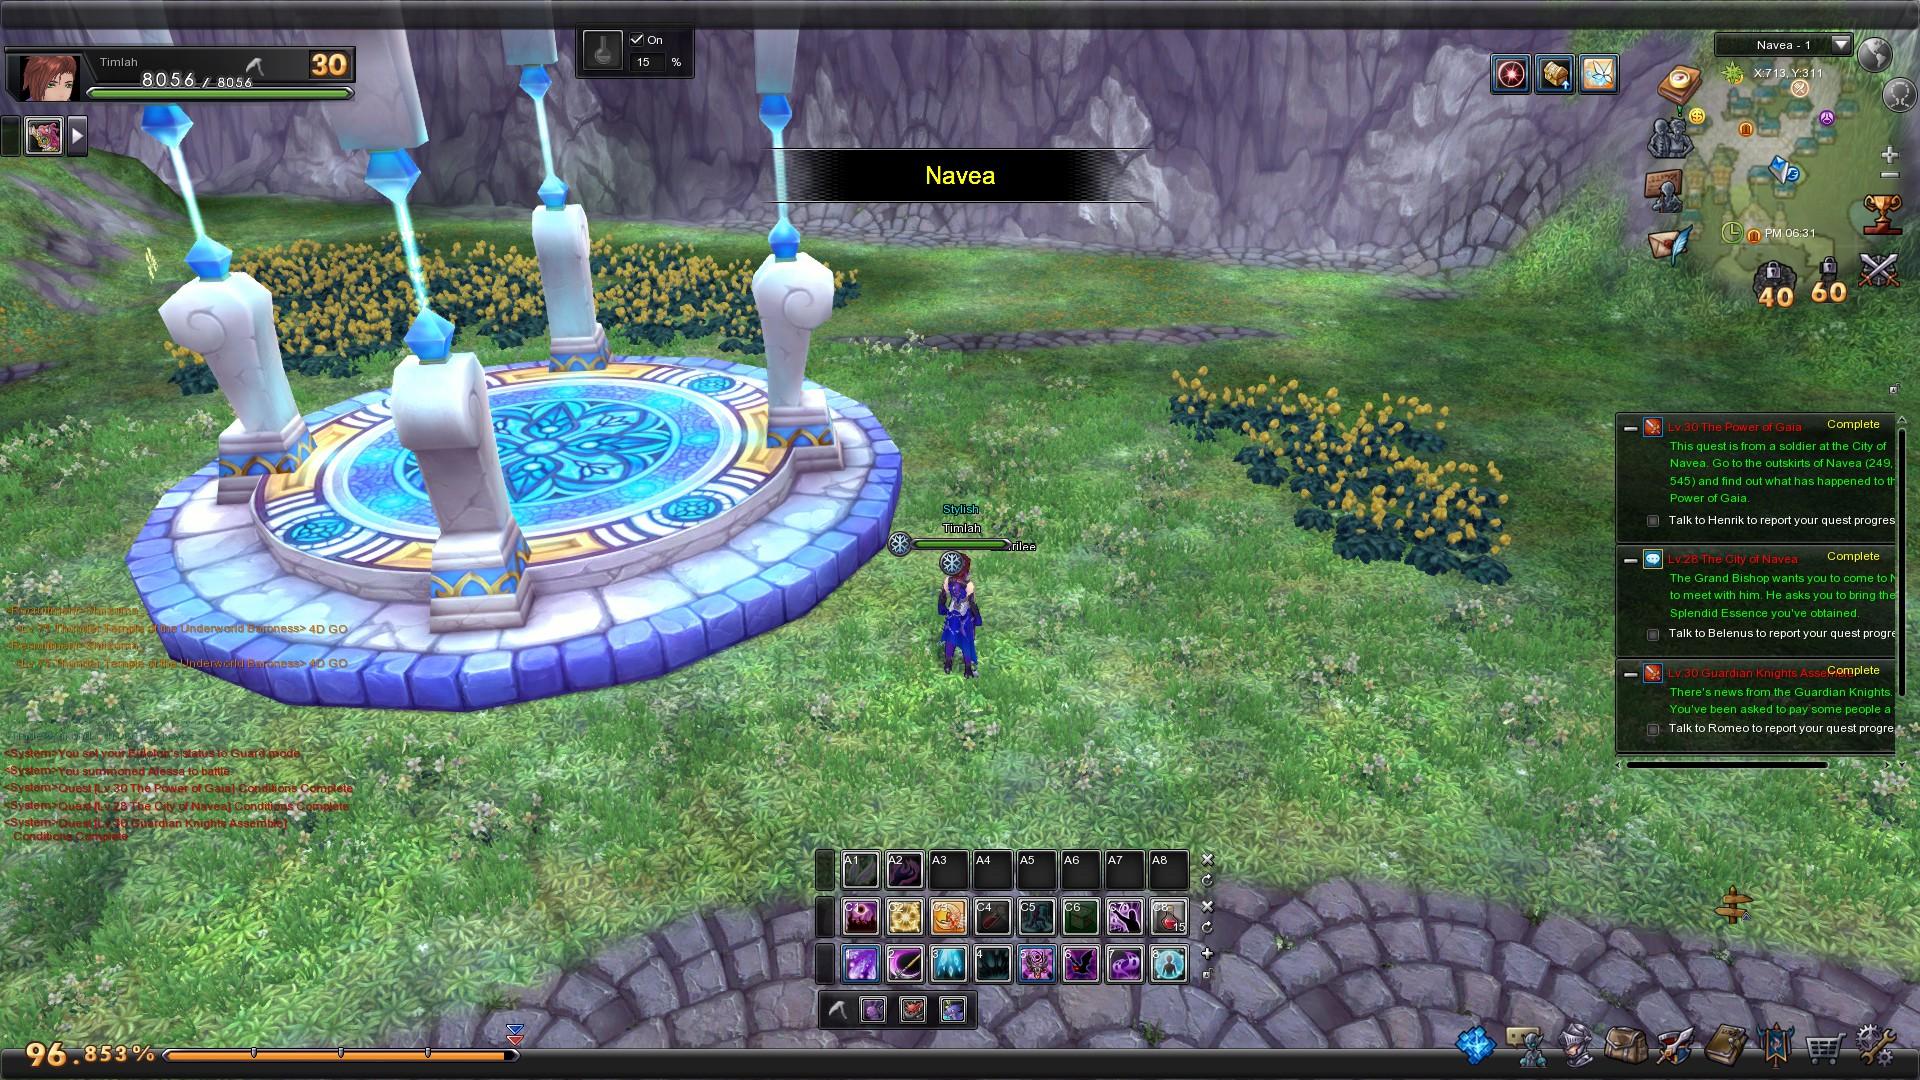 Video Game Review: Aura Kingdom | GeekOut UK